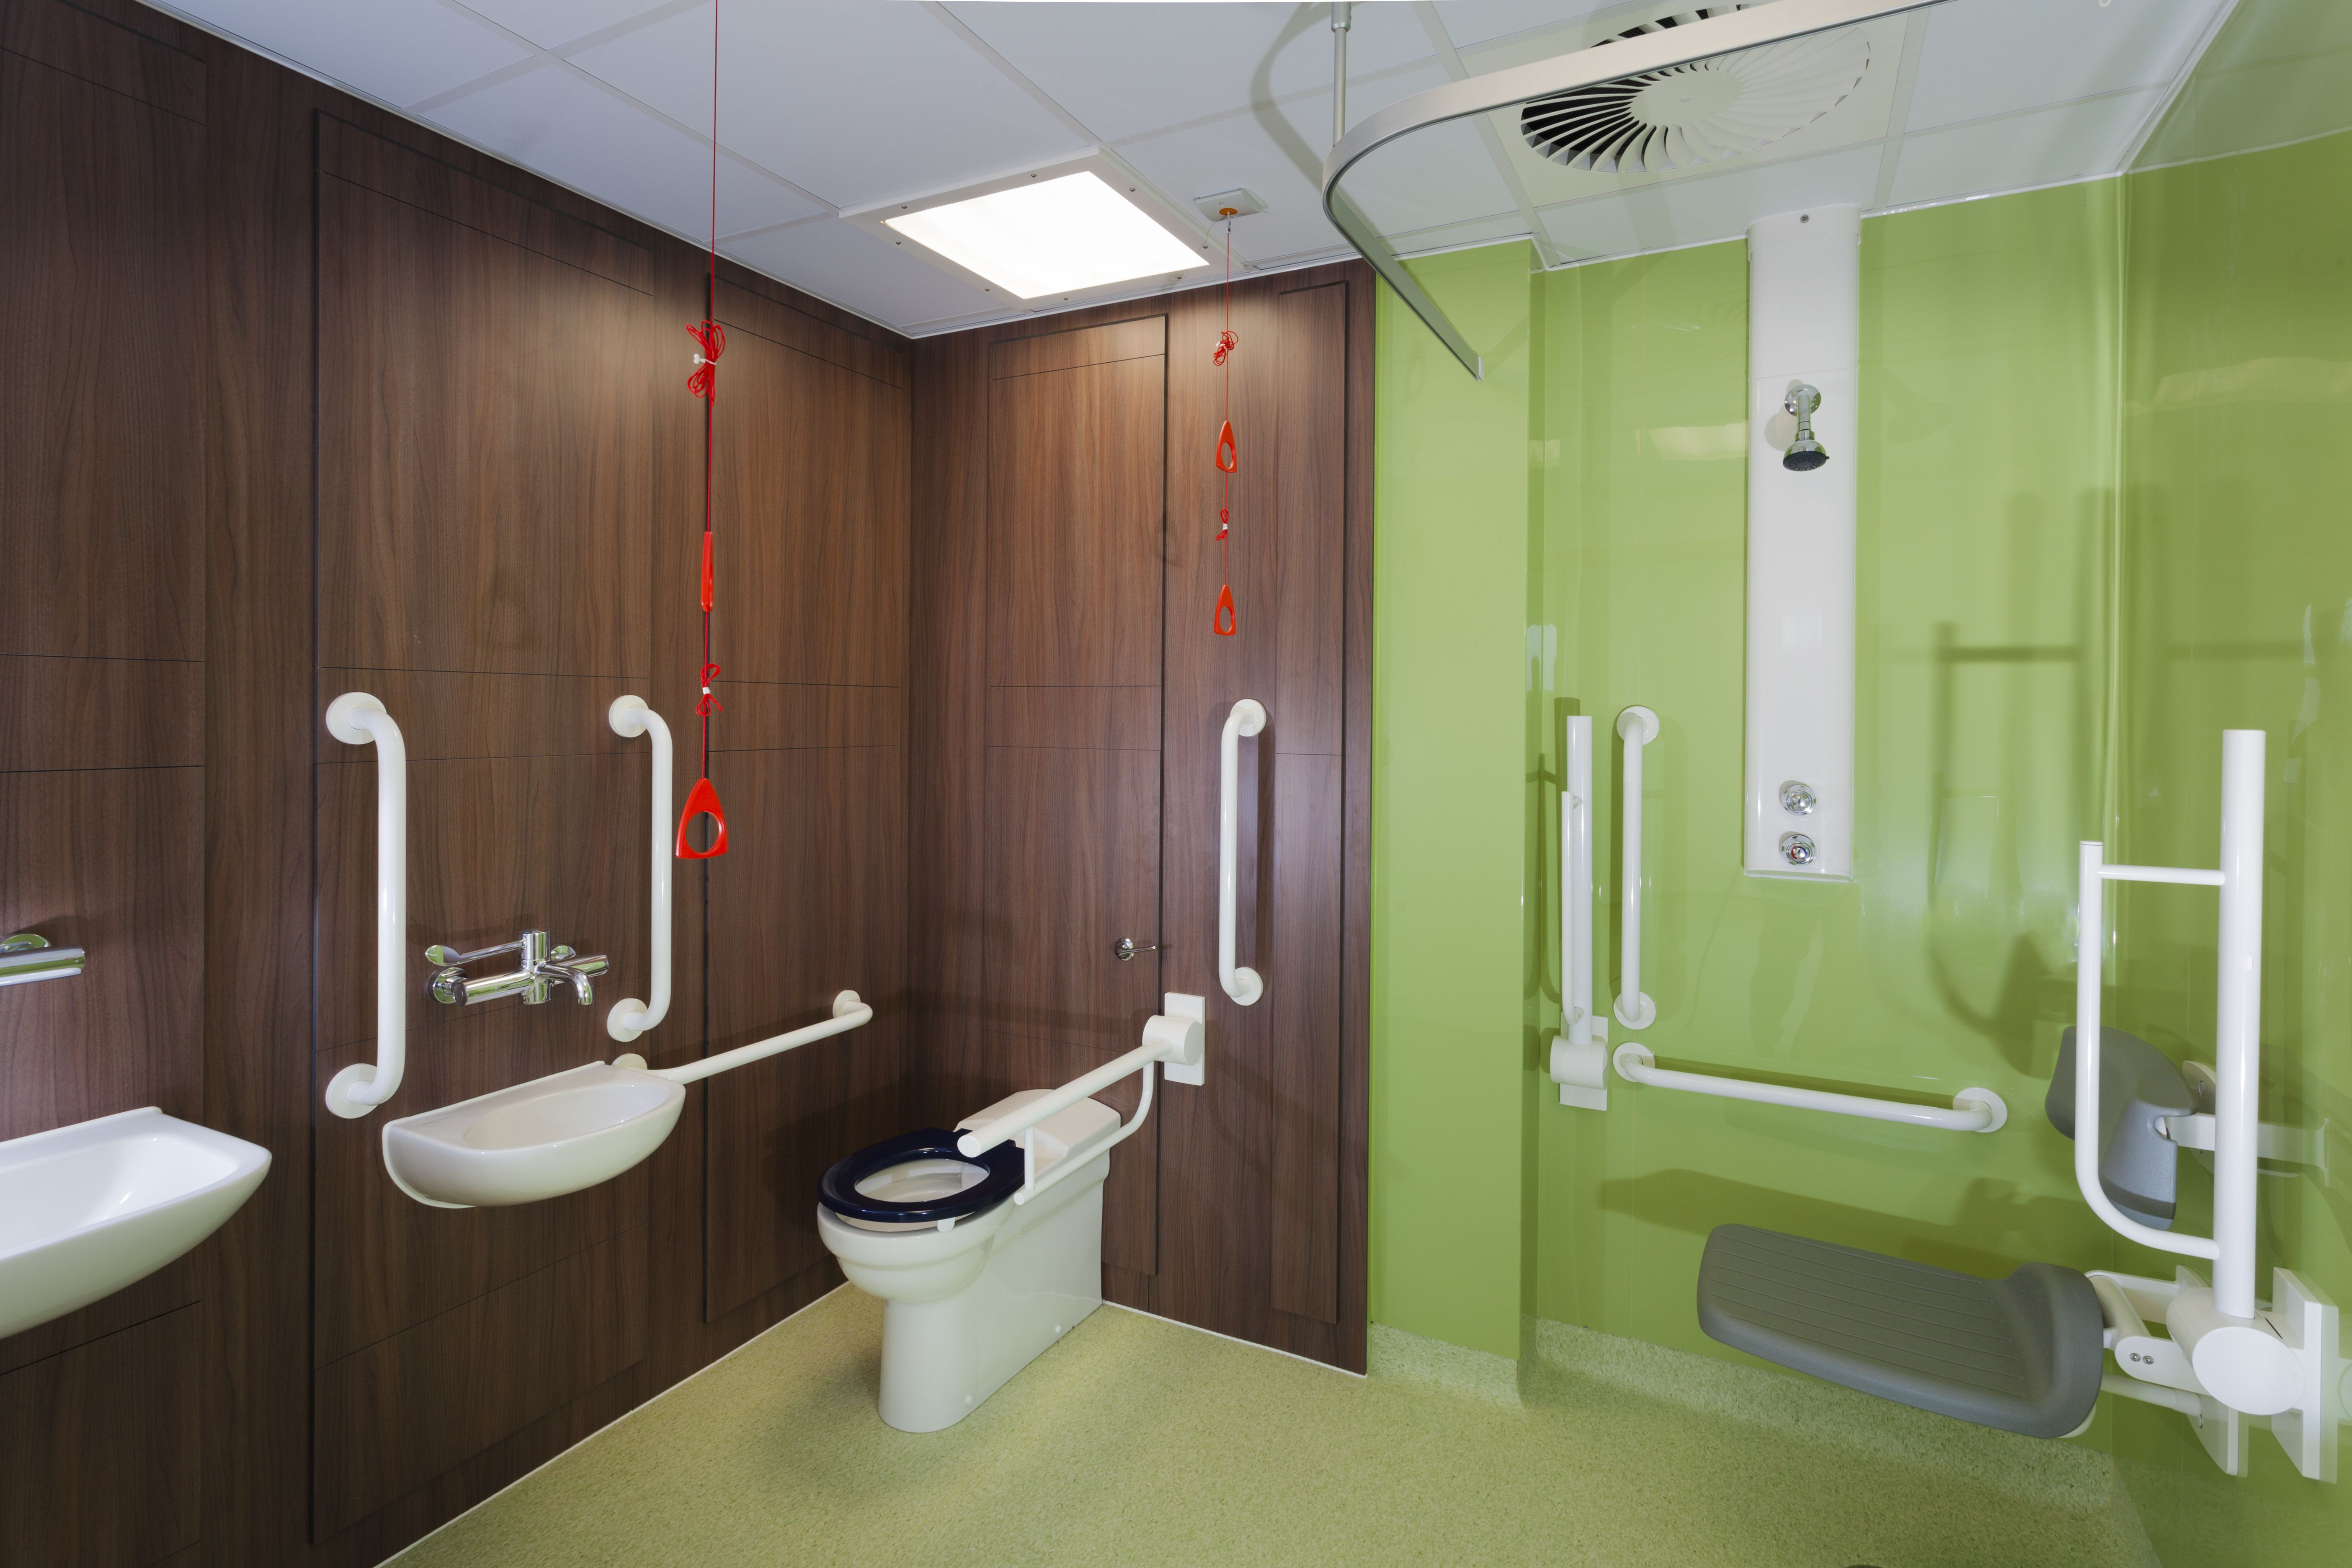 Standard height of bathroom towel bar - Get Ada Handicap Requirements For Construction Of Accessible Bathrooms